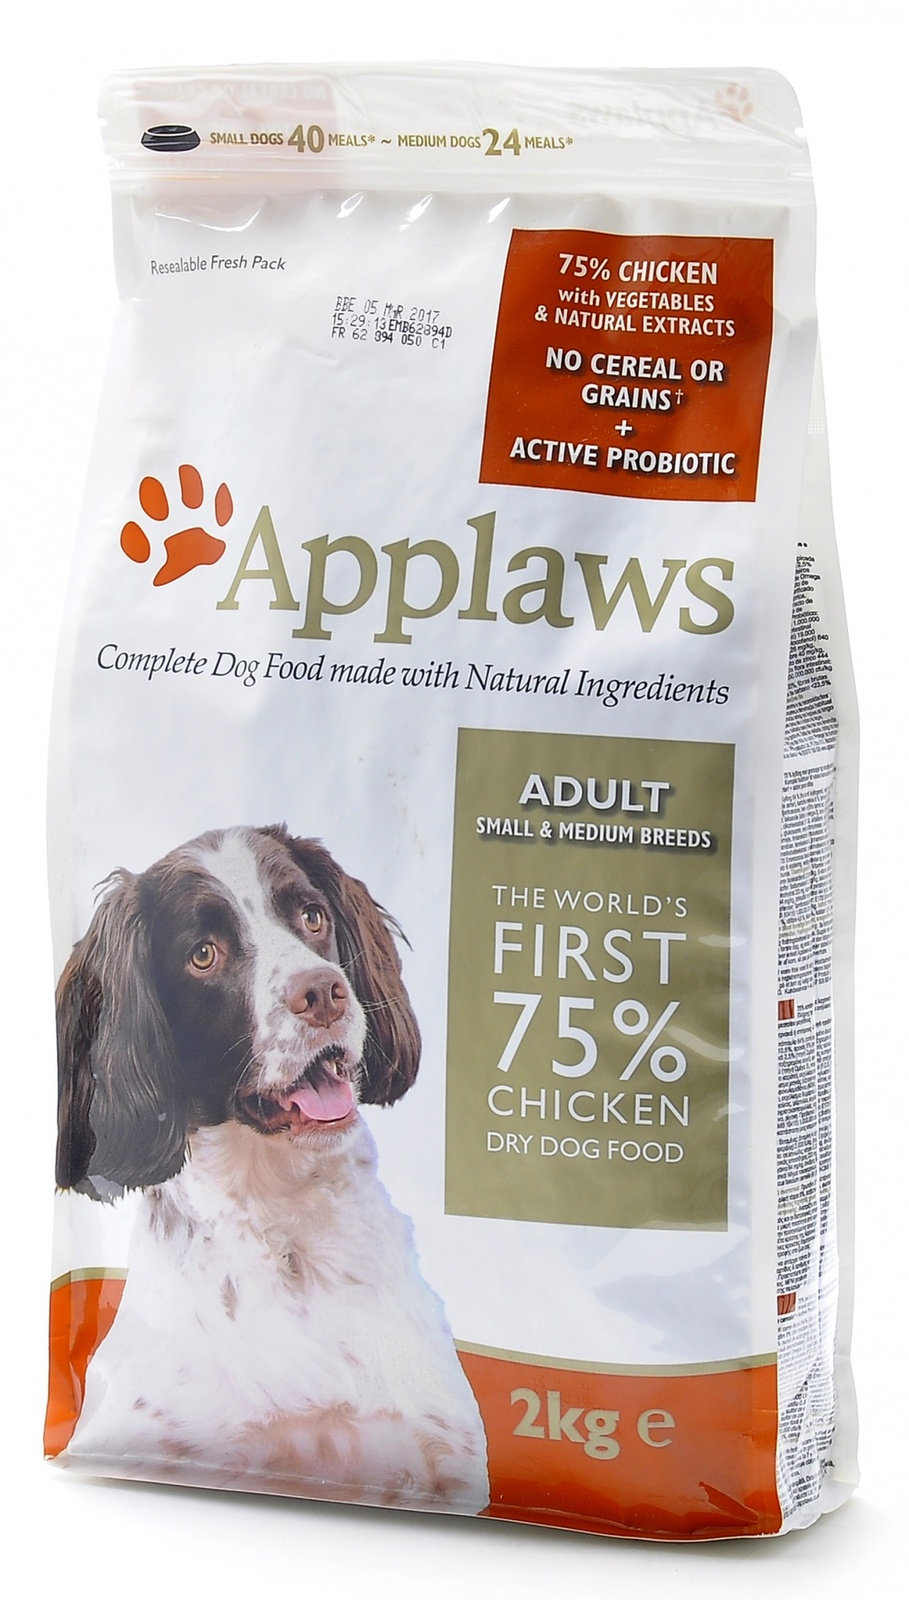 "Applaws Беззерновой для Собак малых и средних пород ""Курица/Овощи: 75/25%"" (Dry Dog Chicken Small & Medium Breed Adult) DD4515C 15кг от Ravta"